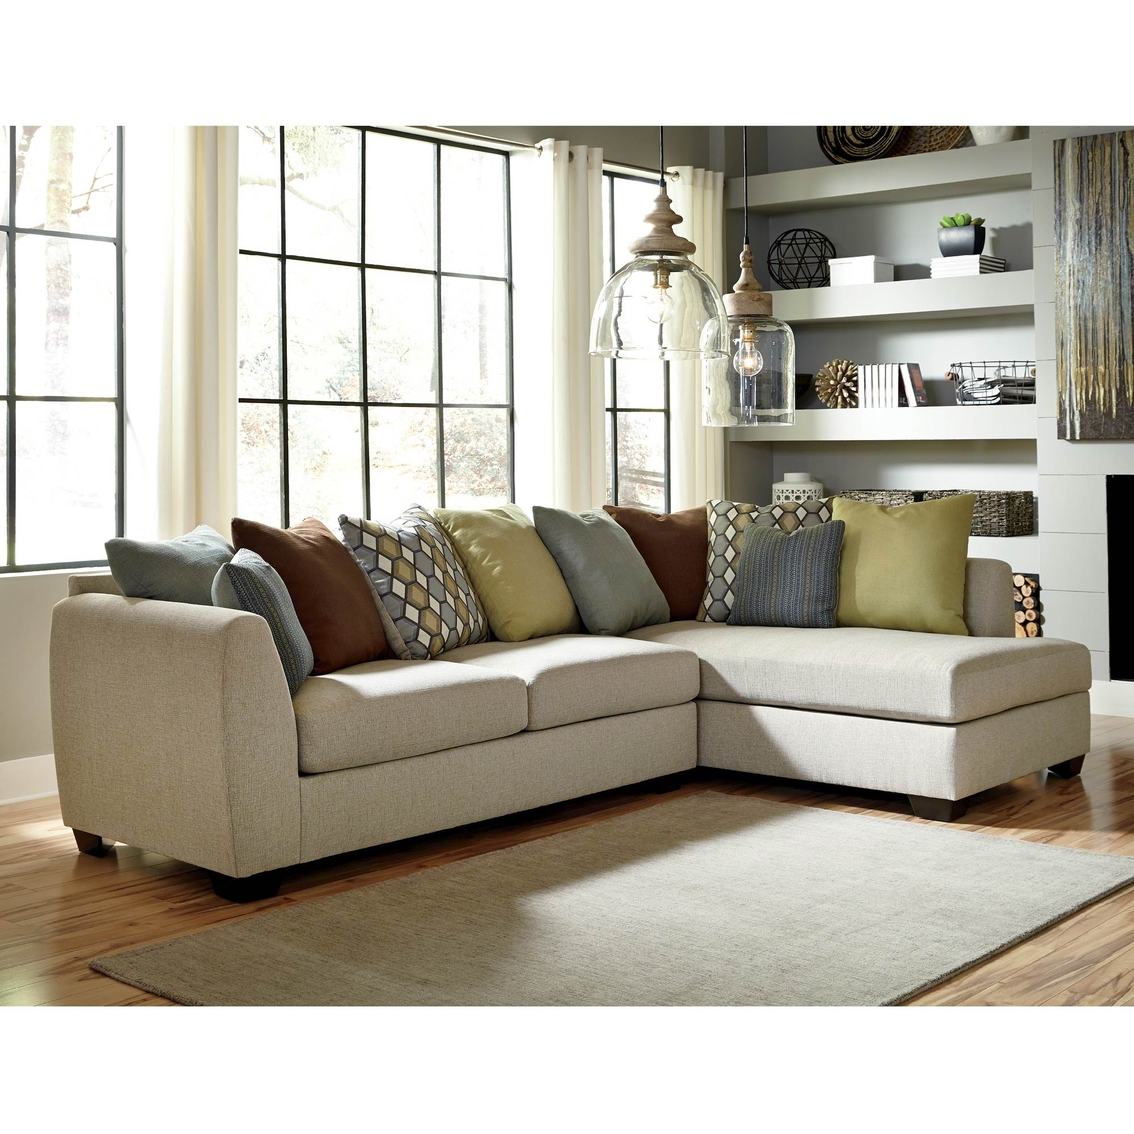 Benchcraft Casheral 2 Pc Sectional Laf Sofa Raf Corner